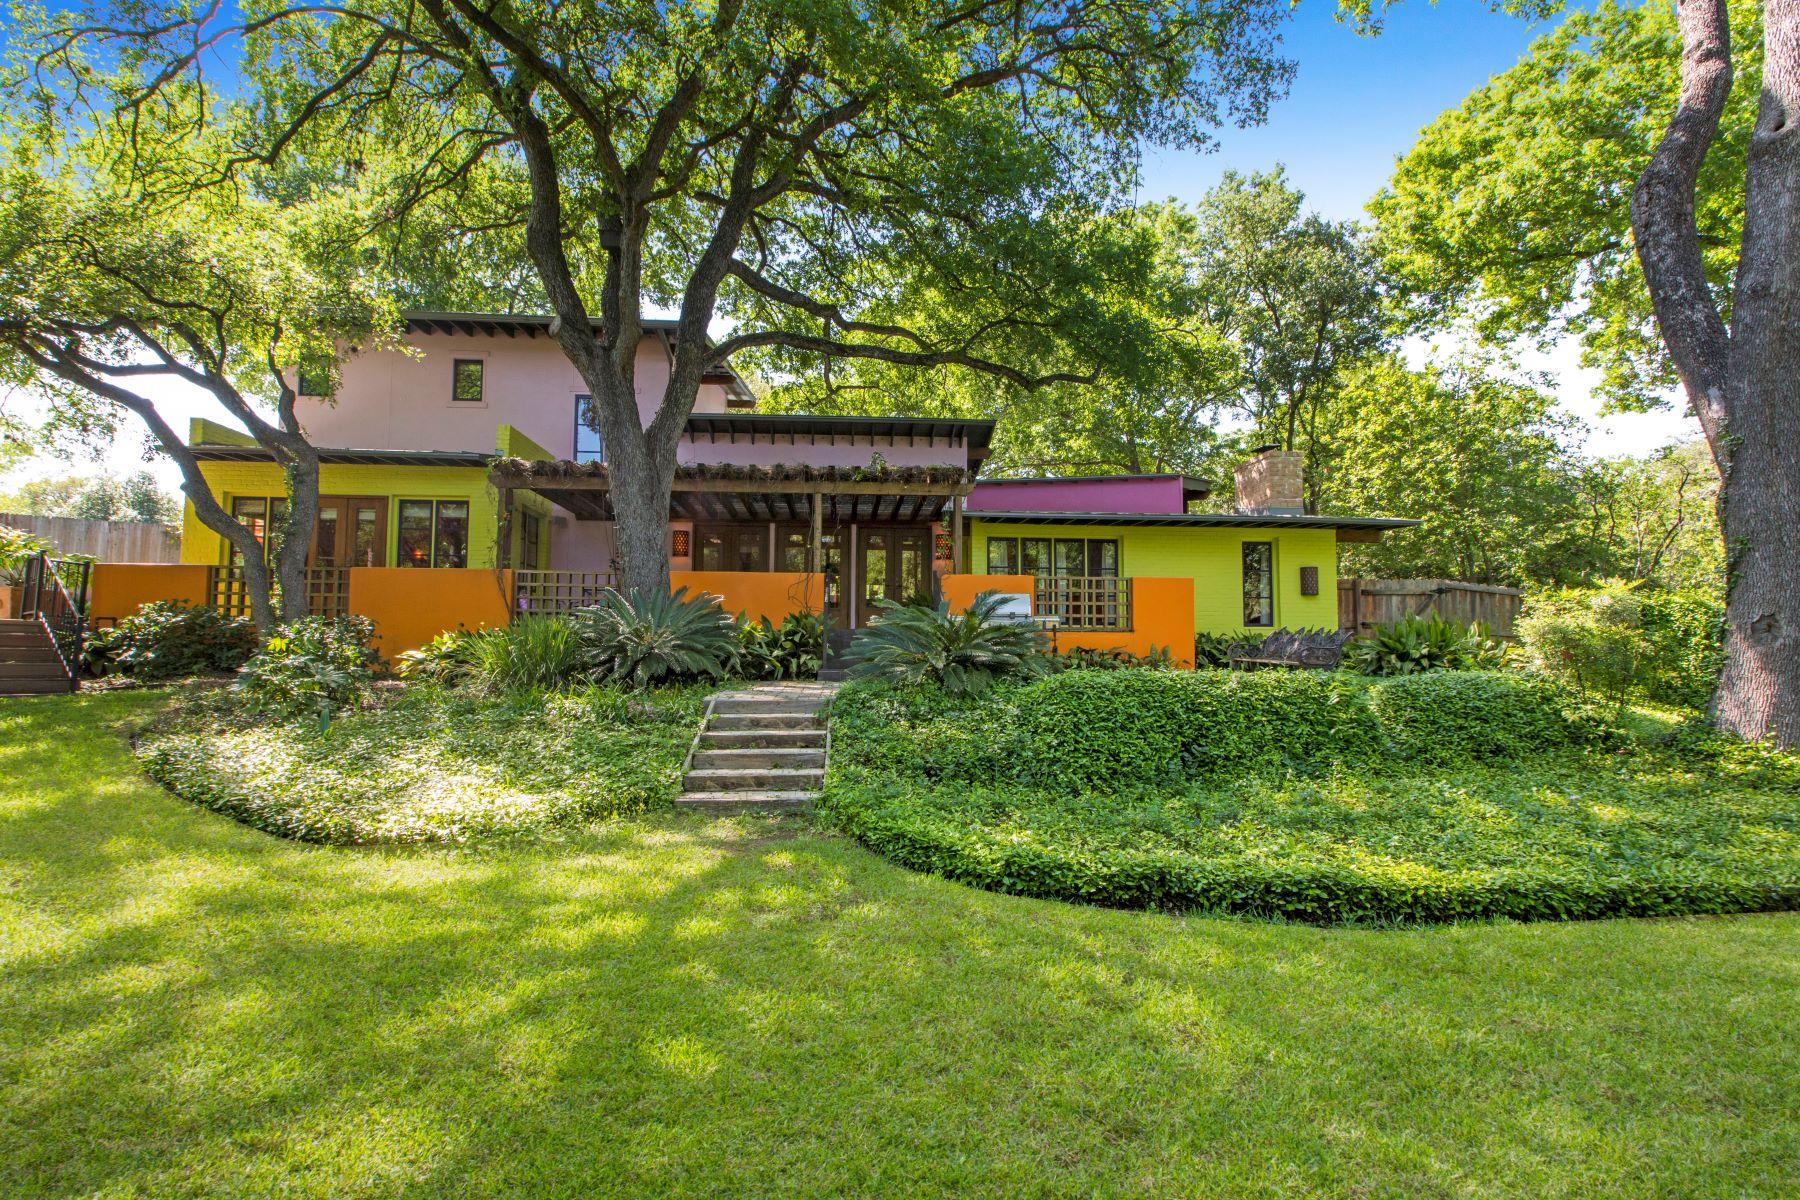 Single Family Homes for Sale at Modernist Hacienda in Terrell Hills 129 Newbury Terrace San Antonio, Texas 78209 United States